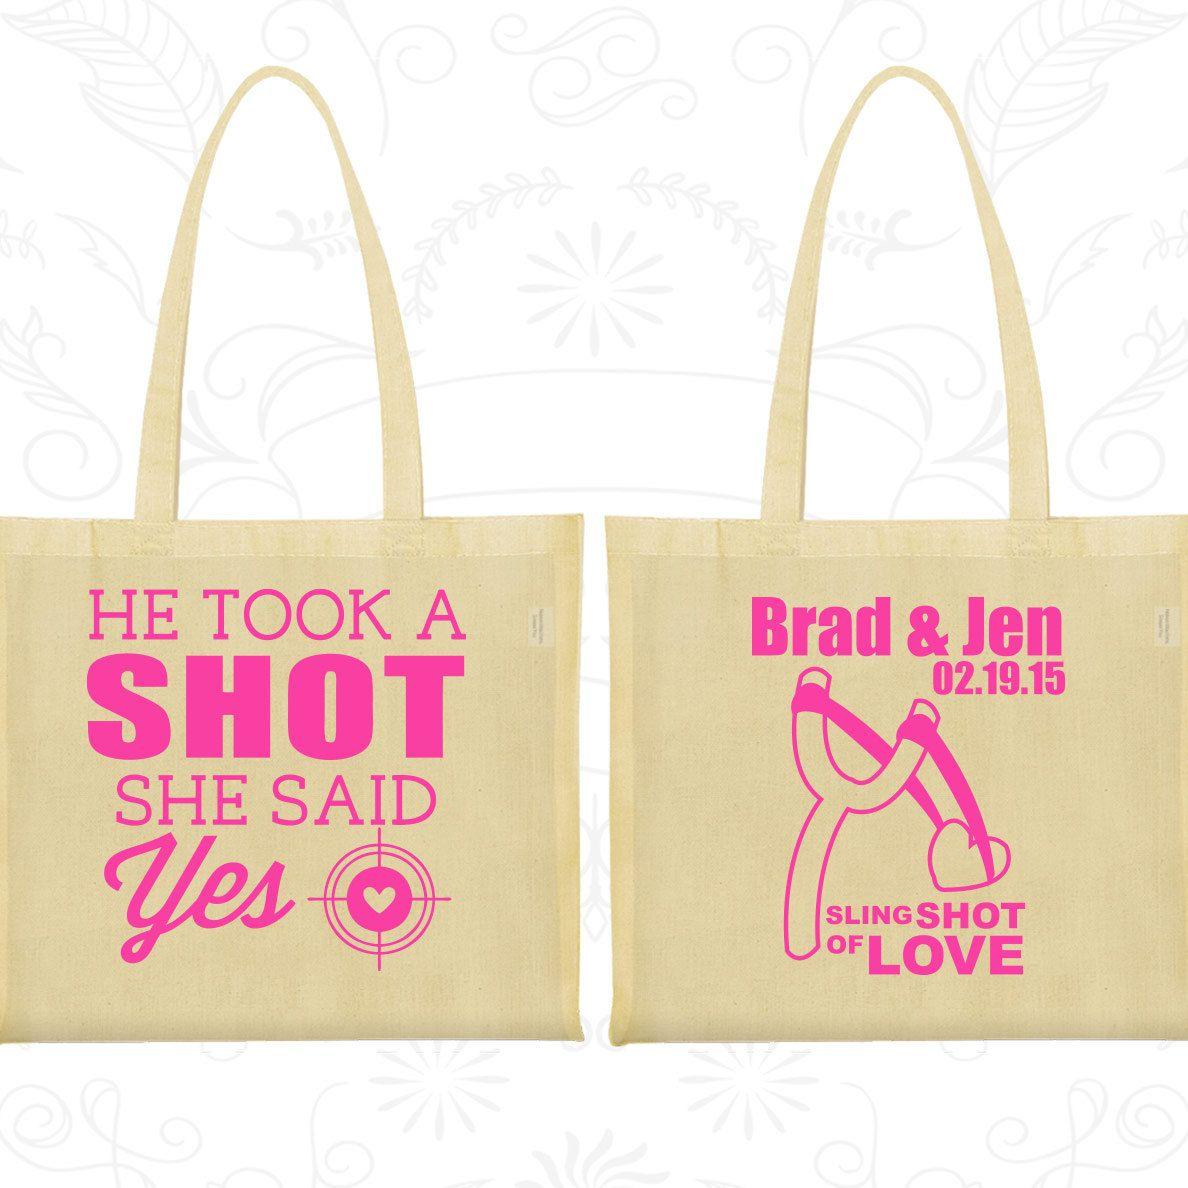 Wedding Welcome Bags, Tote Bags, Wedding Tote Bags, Personalized Tote Bags, Custom Tote Bags, Wedding Bags, Wedding Favor Bags (558)